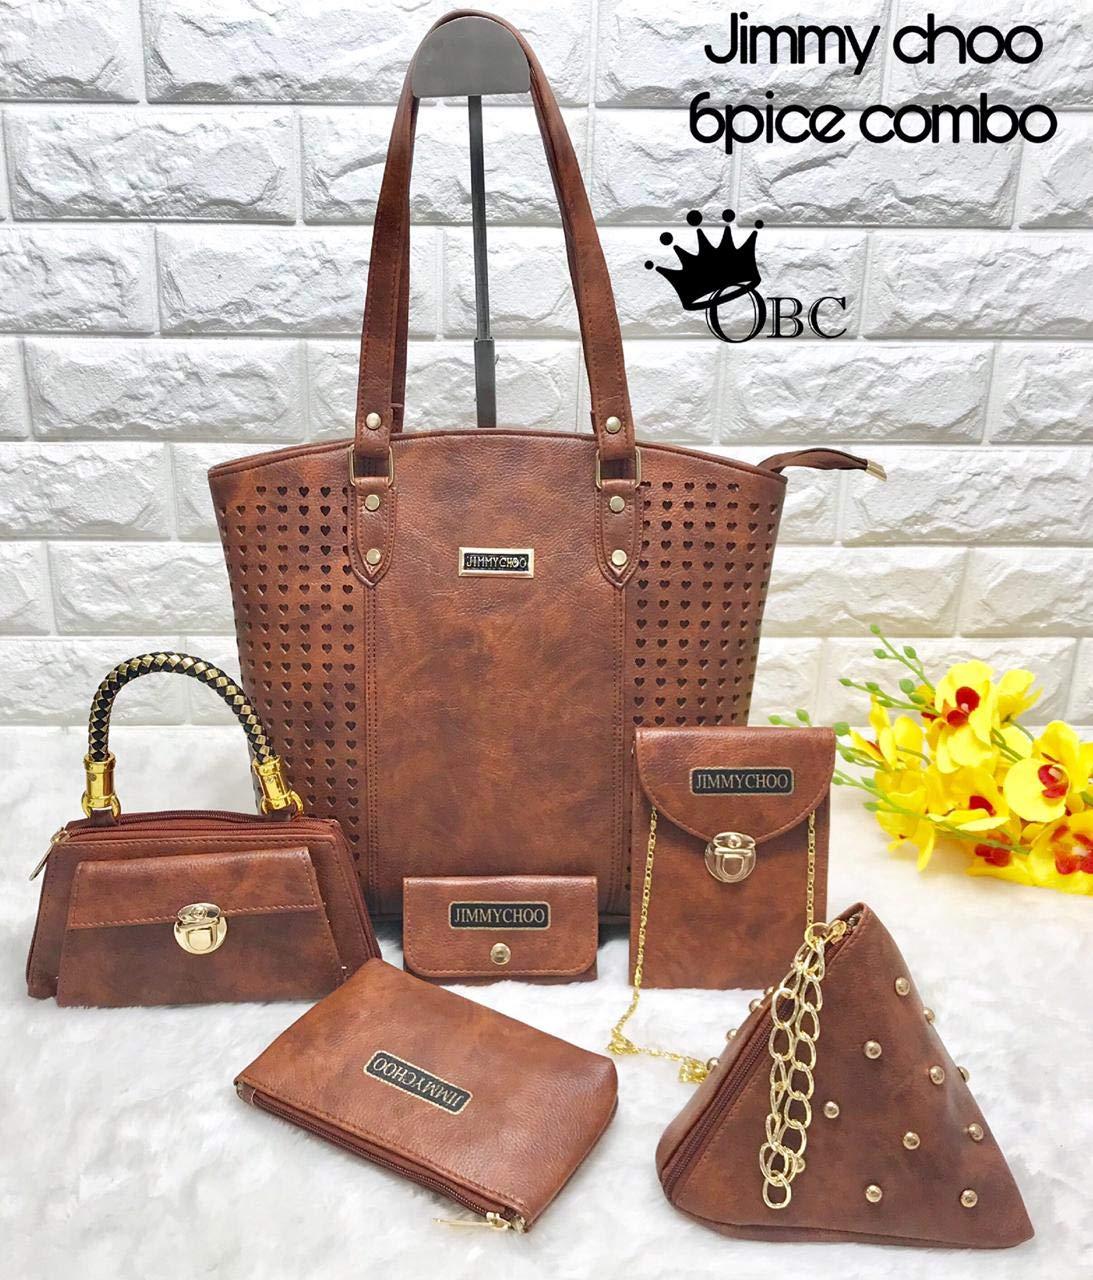 23311baa7b7 Buy jimmy choo, zara, mk branded Women's Handbag, Duffel, Shoulder, Wallet,  Pouch, Mobile-Bag, Sling Bag, Small Purse (Brown) - Set of 8 Online at Low  ...